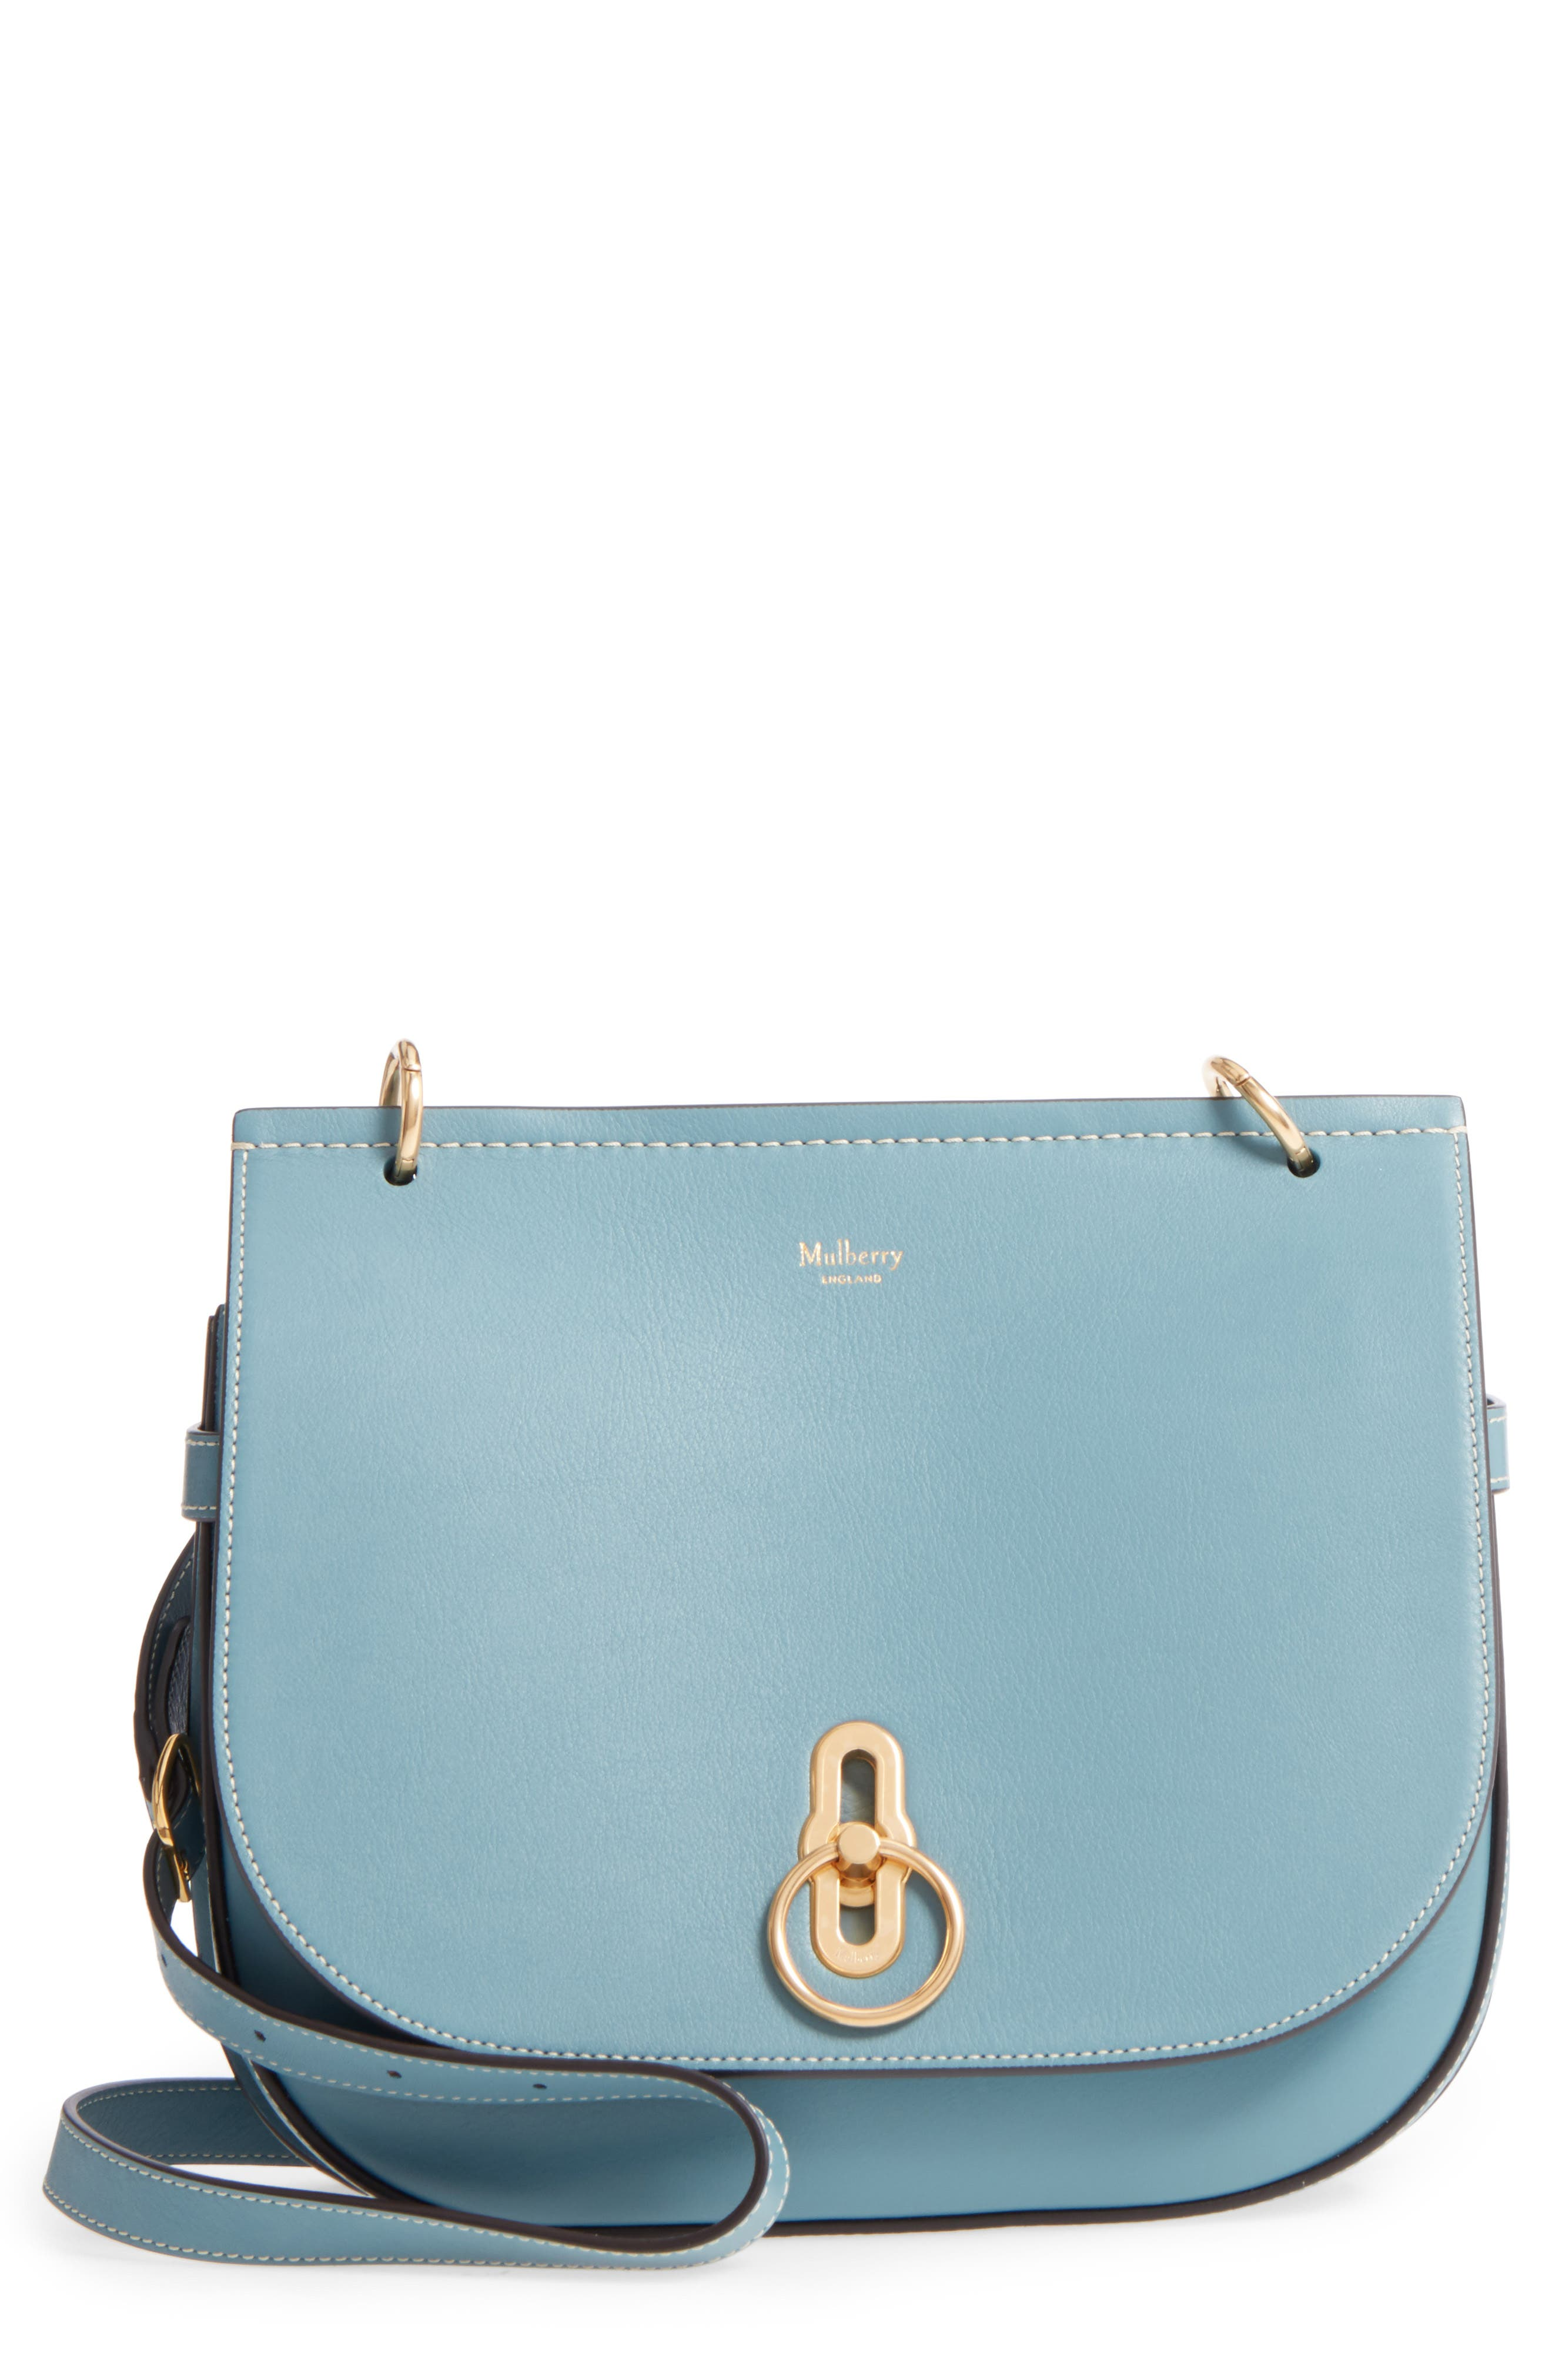 Amberley Calfskin Leather Shoulder Bag,                             Main thumbnail 1, color,                             Blue